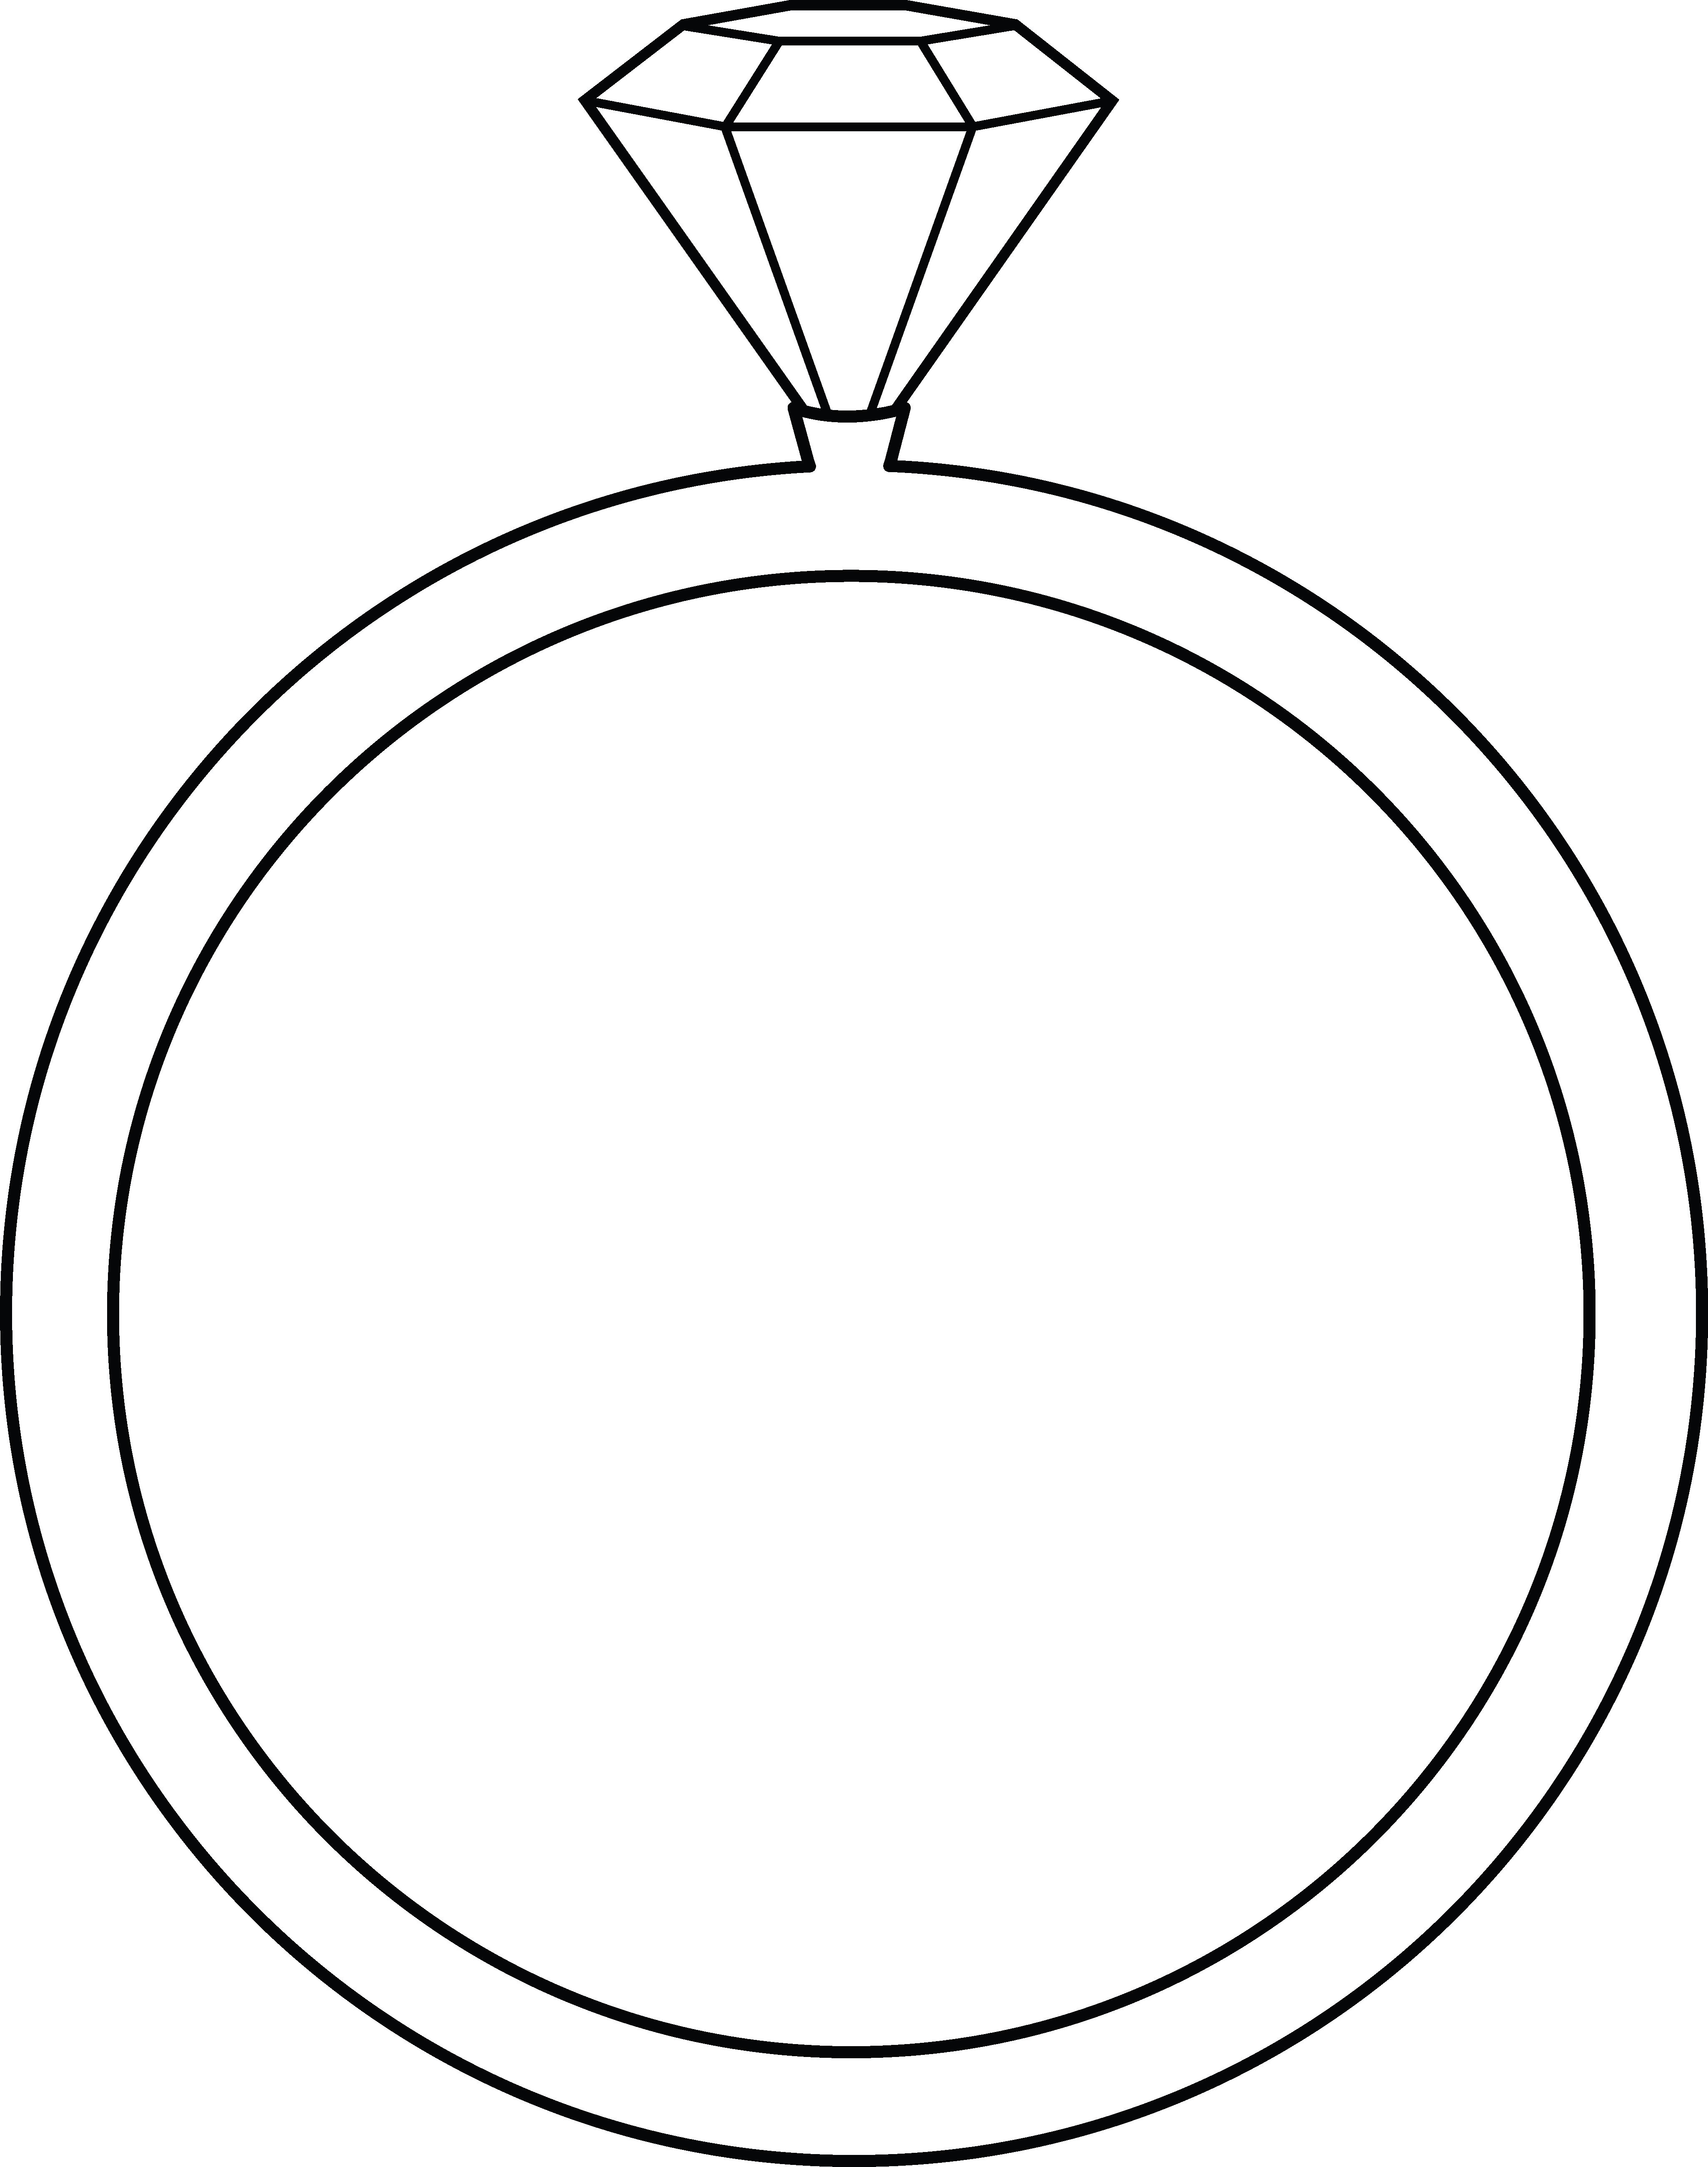 Diamond Ring Lineart.